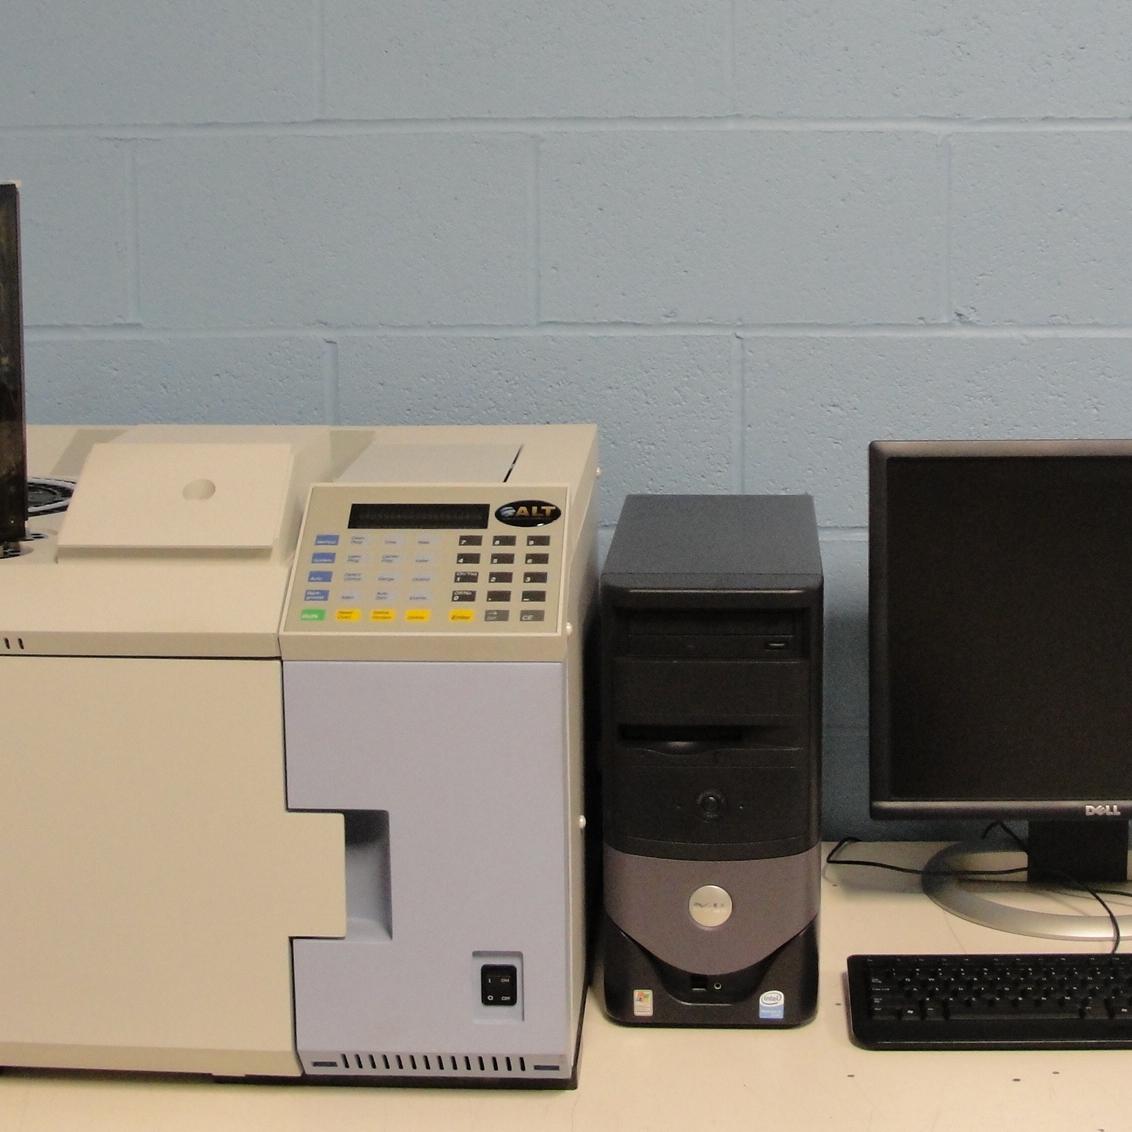 Perkin Elmer Autosystem XL Gas Chromatograph Image